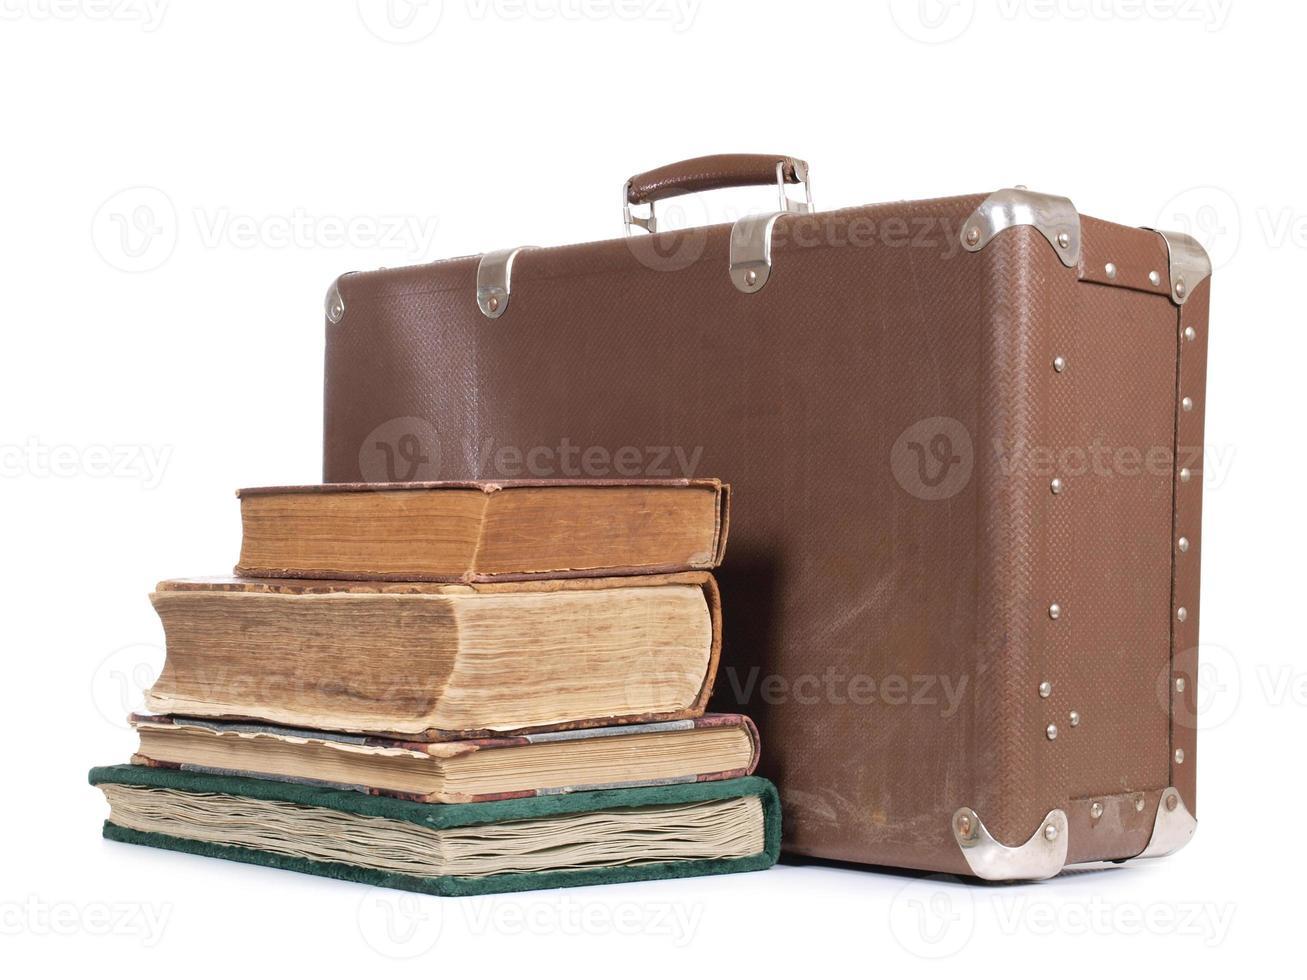 valise et livre photo